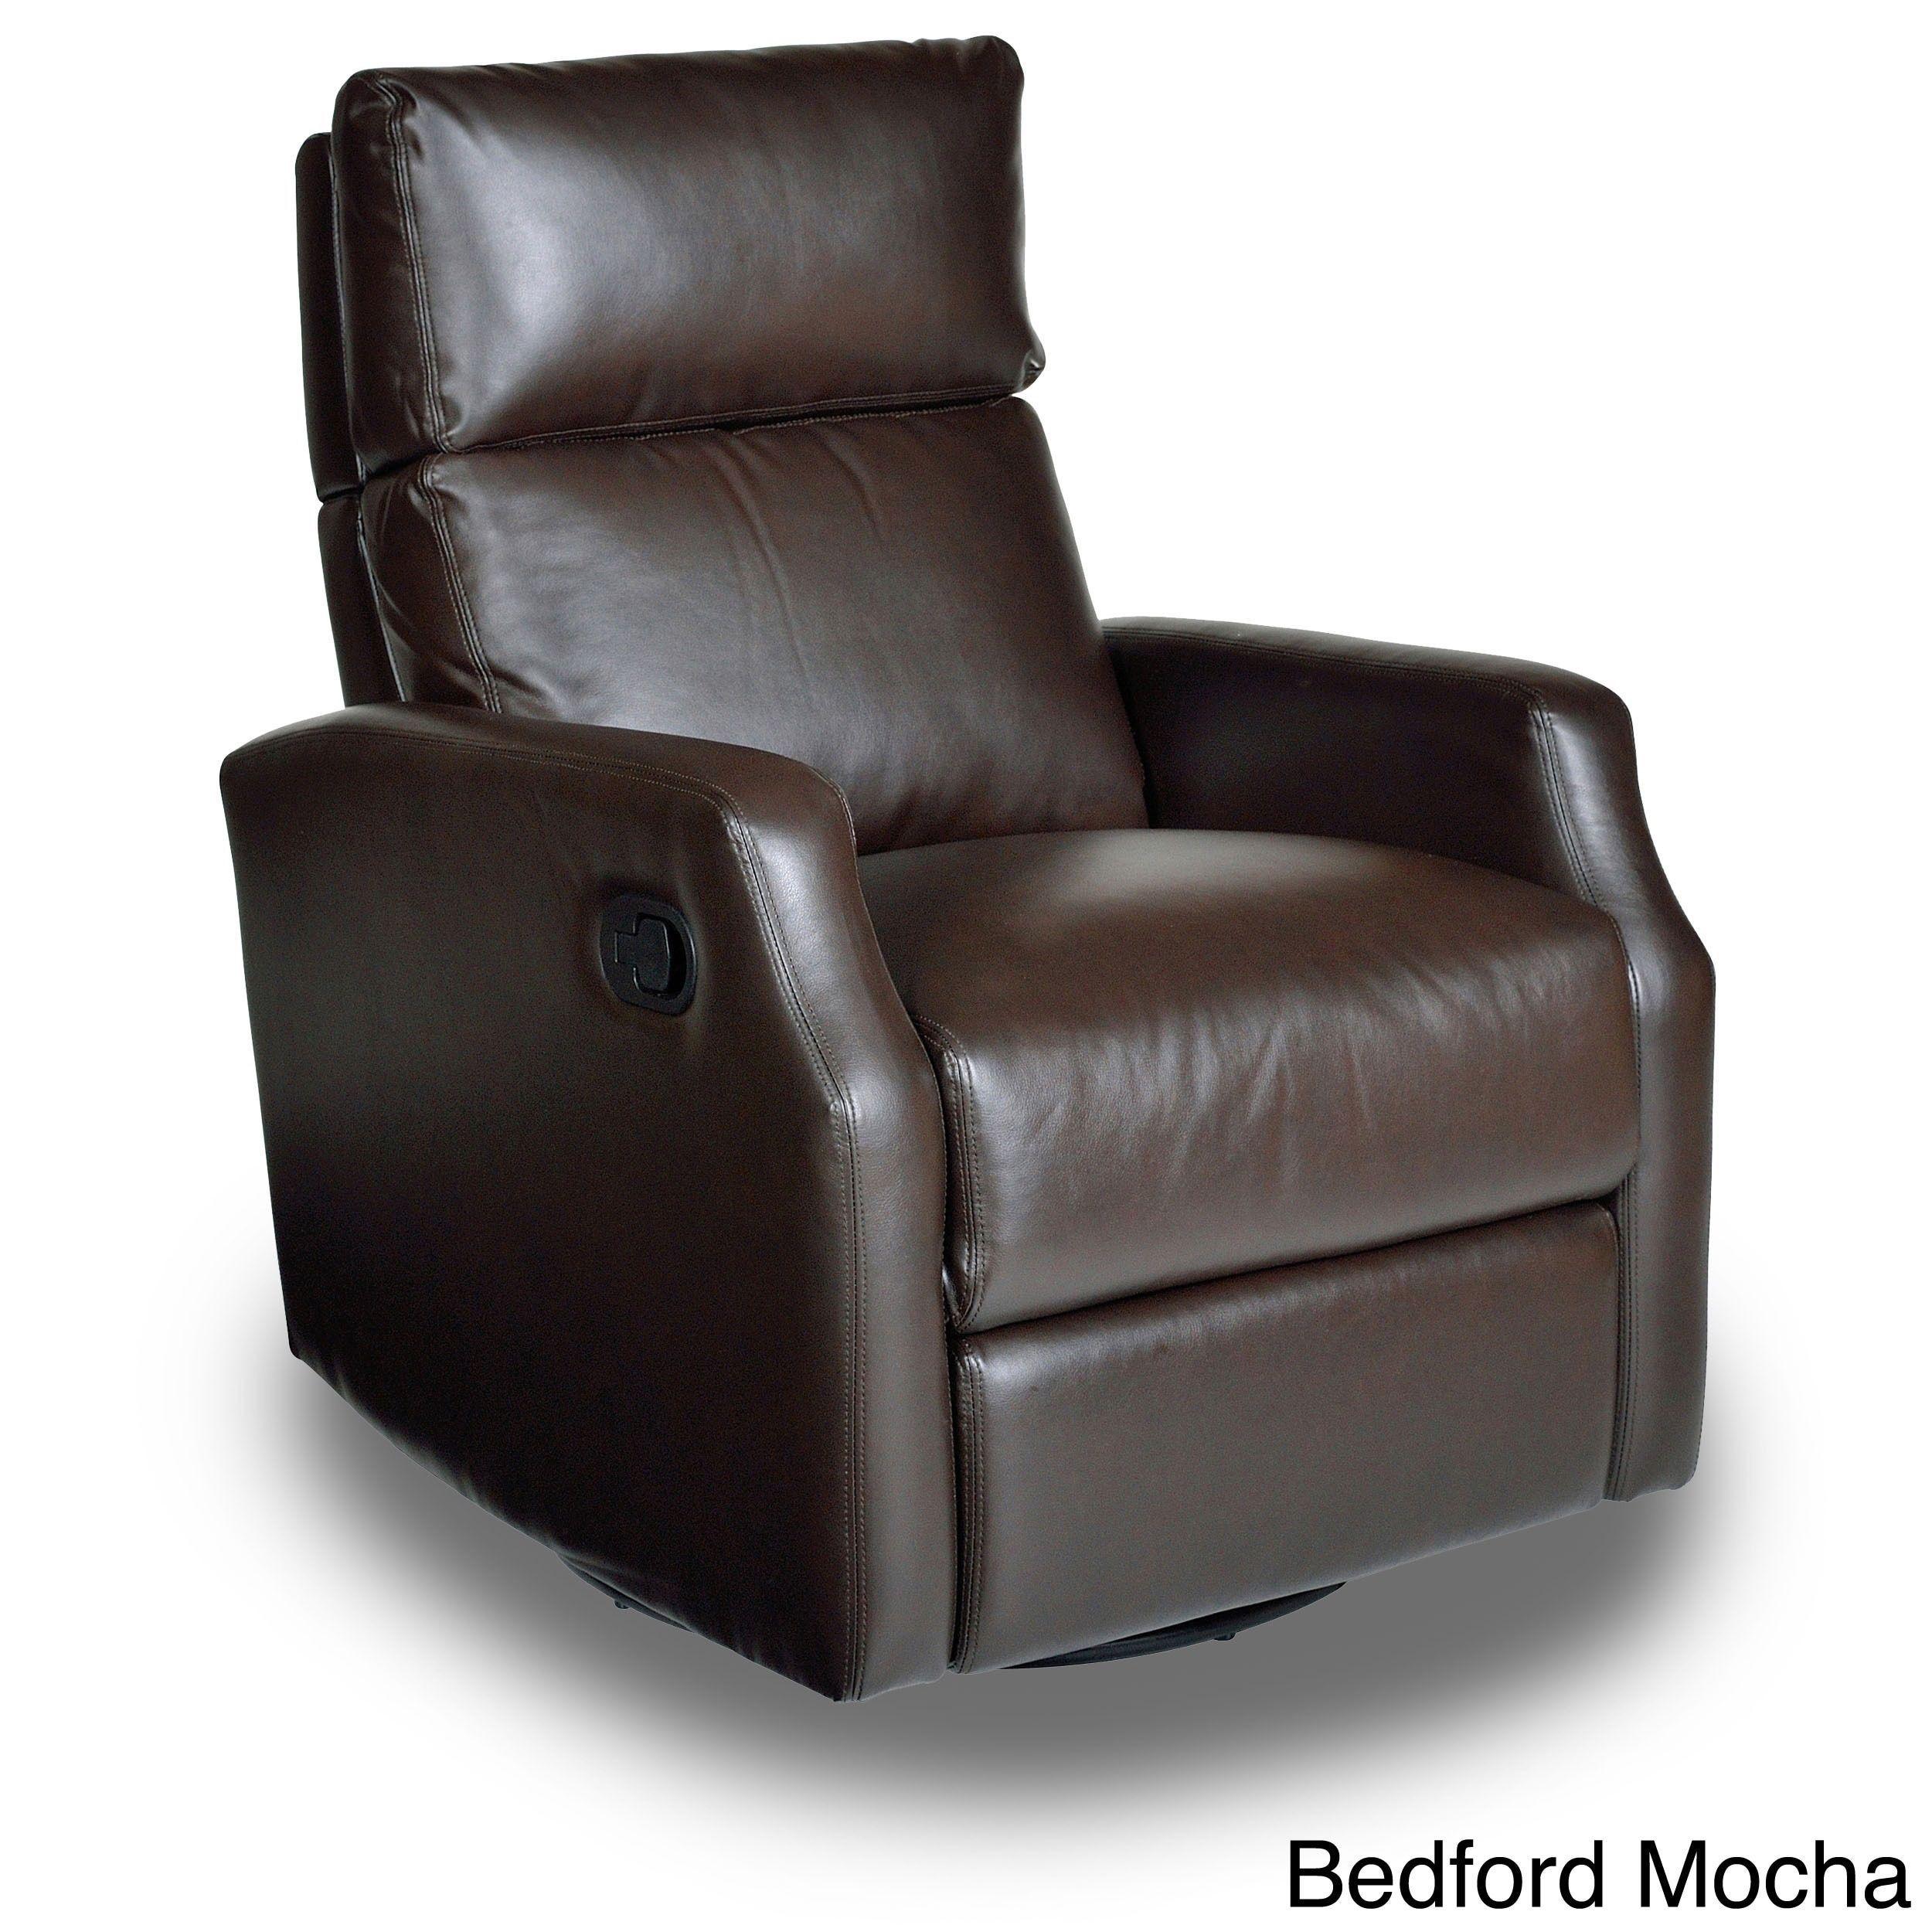 Opulence Home Sidney Swivel Glider Recliner (Bedford Mocha), Size Oversized  (Leather)